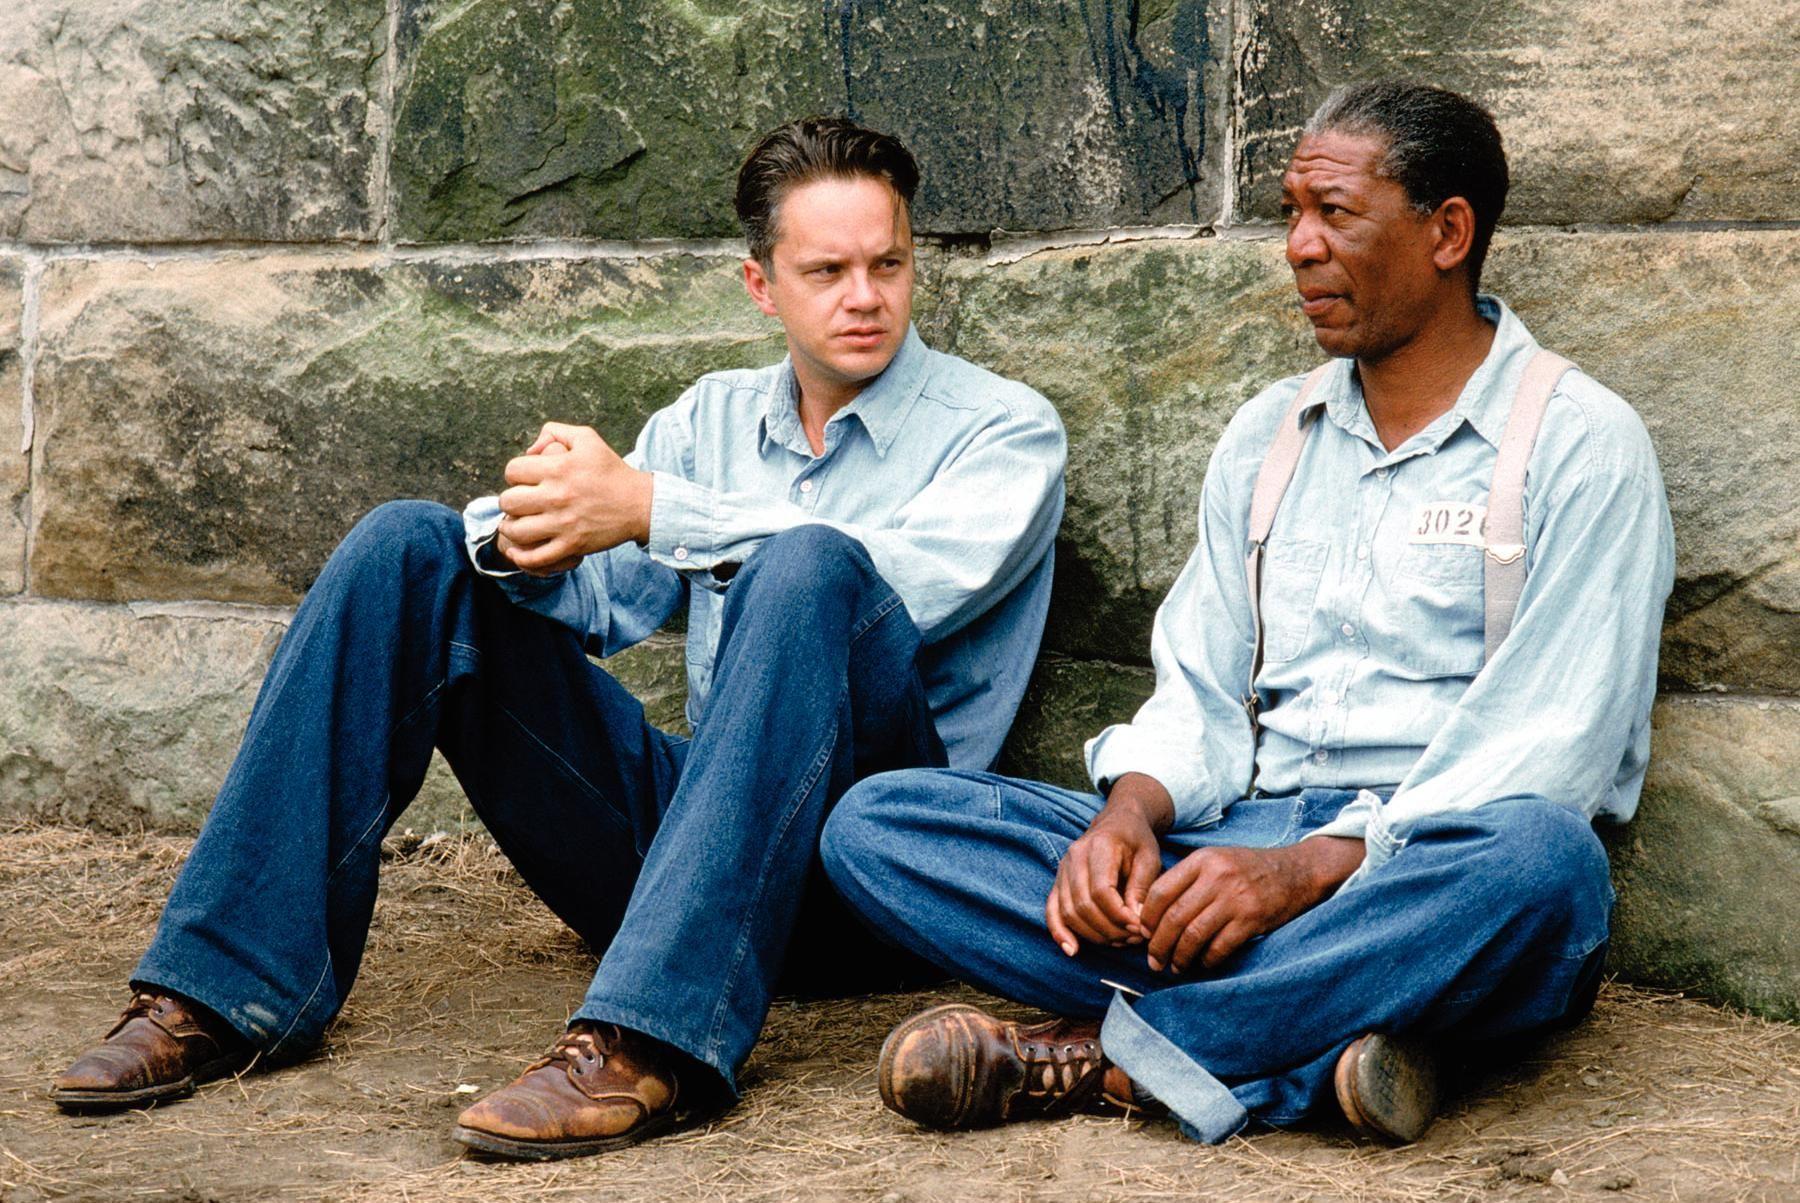 Morgan Freeman and Tim Robbins in The Shawshank Redemption (1994)